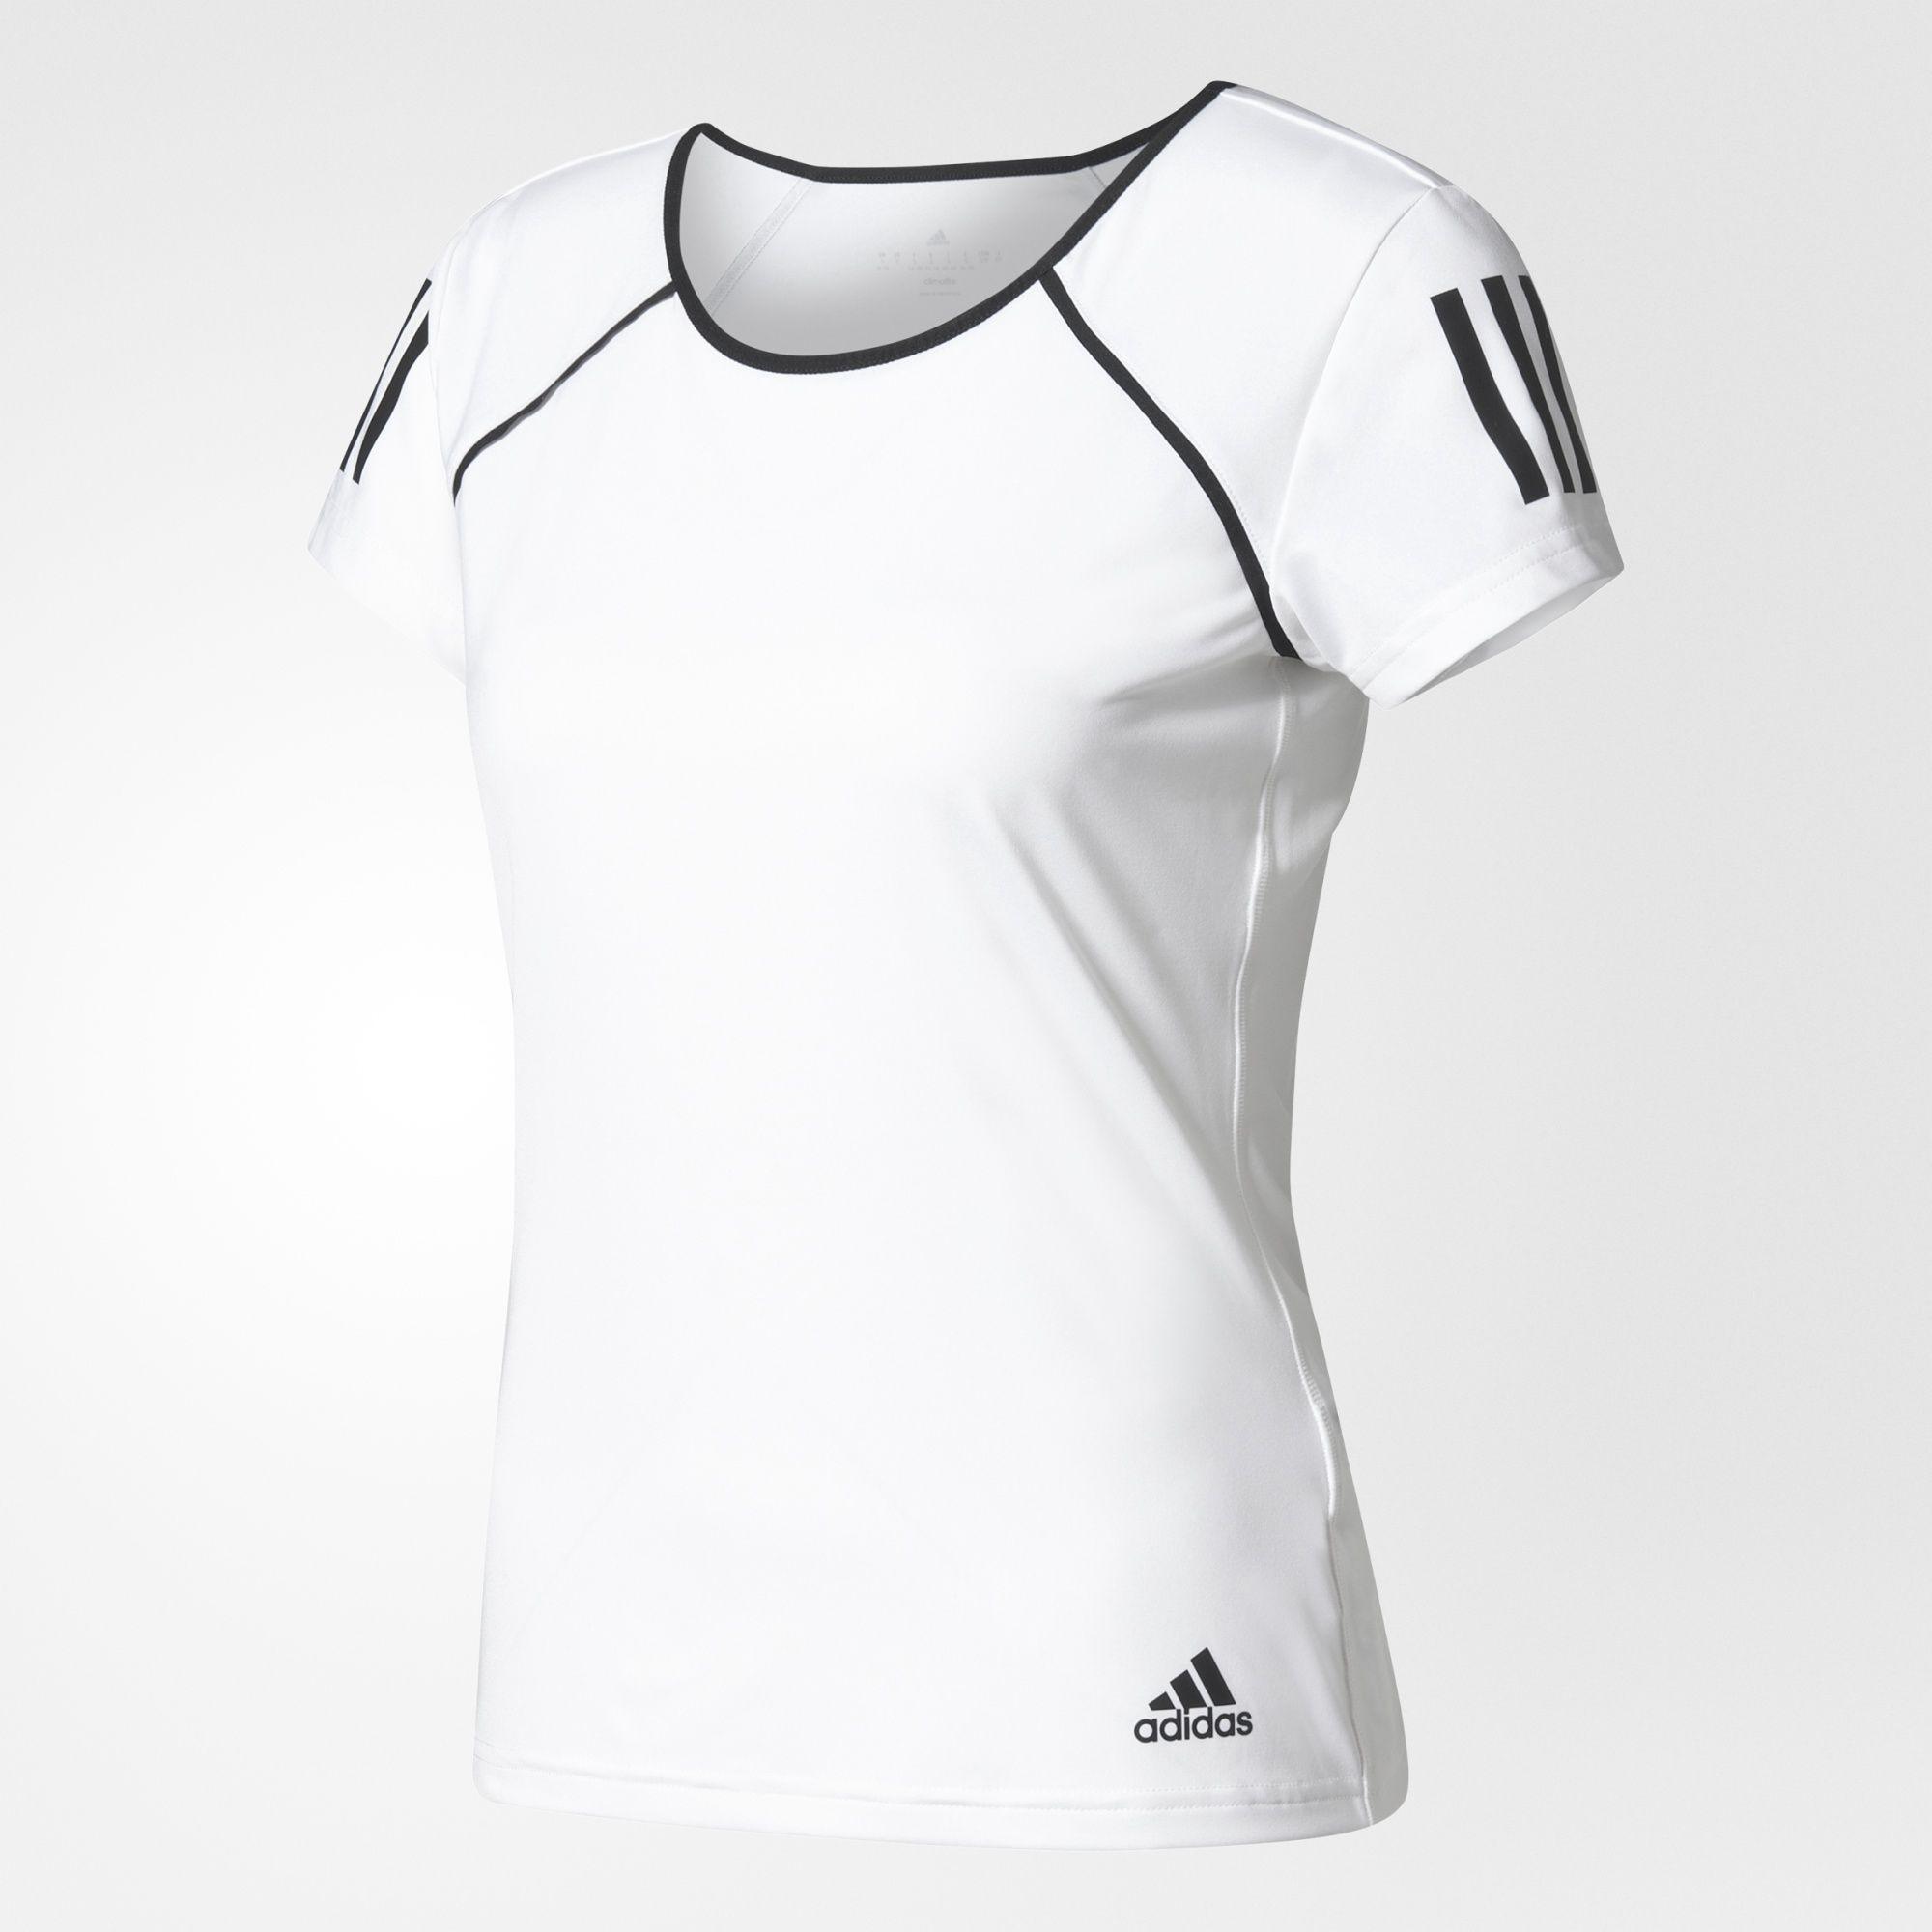 Adidas Pádel De 2017 Camiseta Mujer Tenis Blannegra Y Club O0wNvm8n